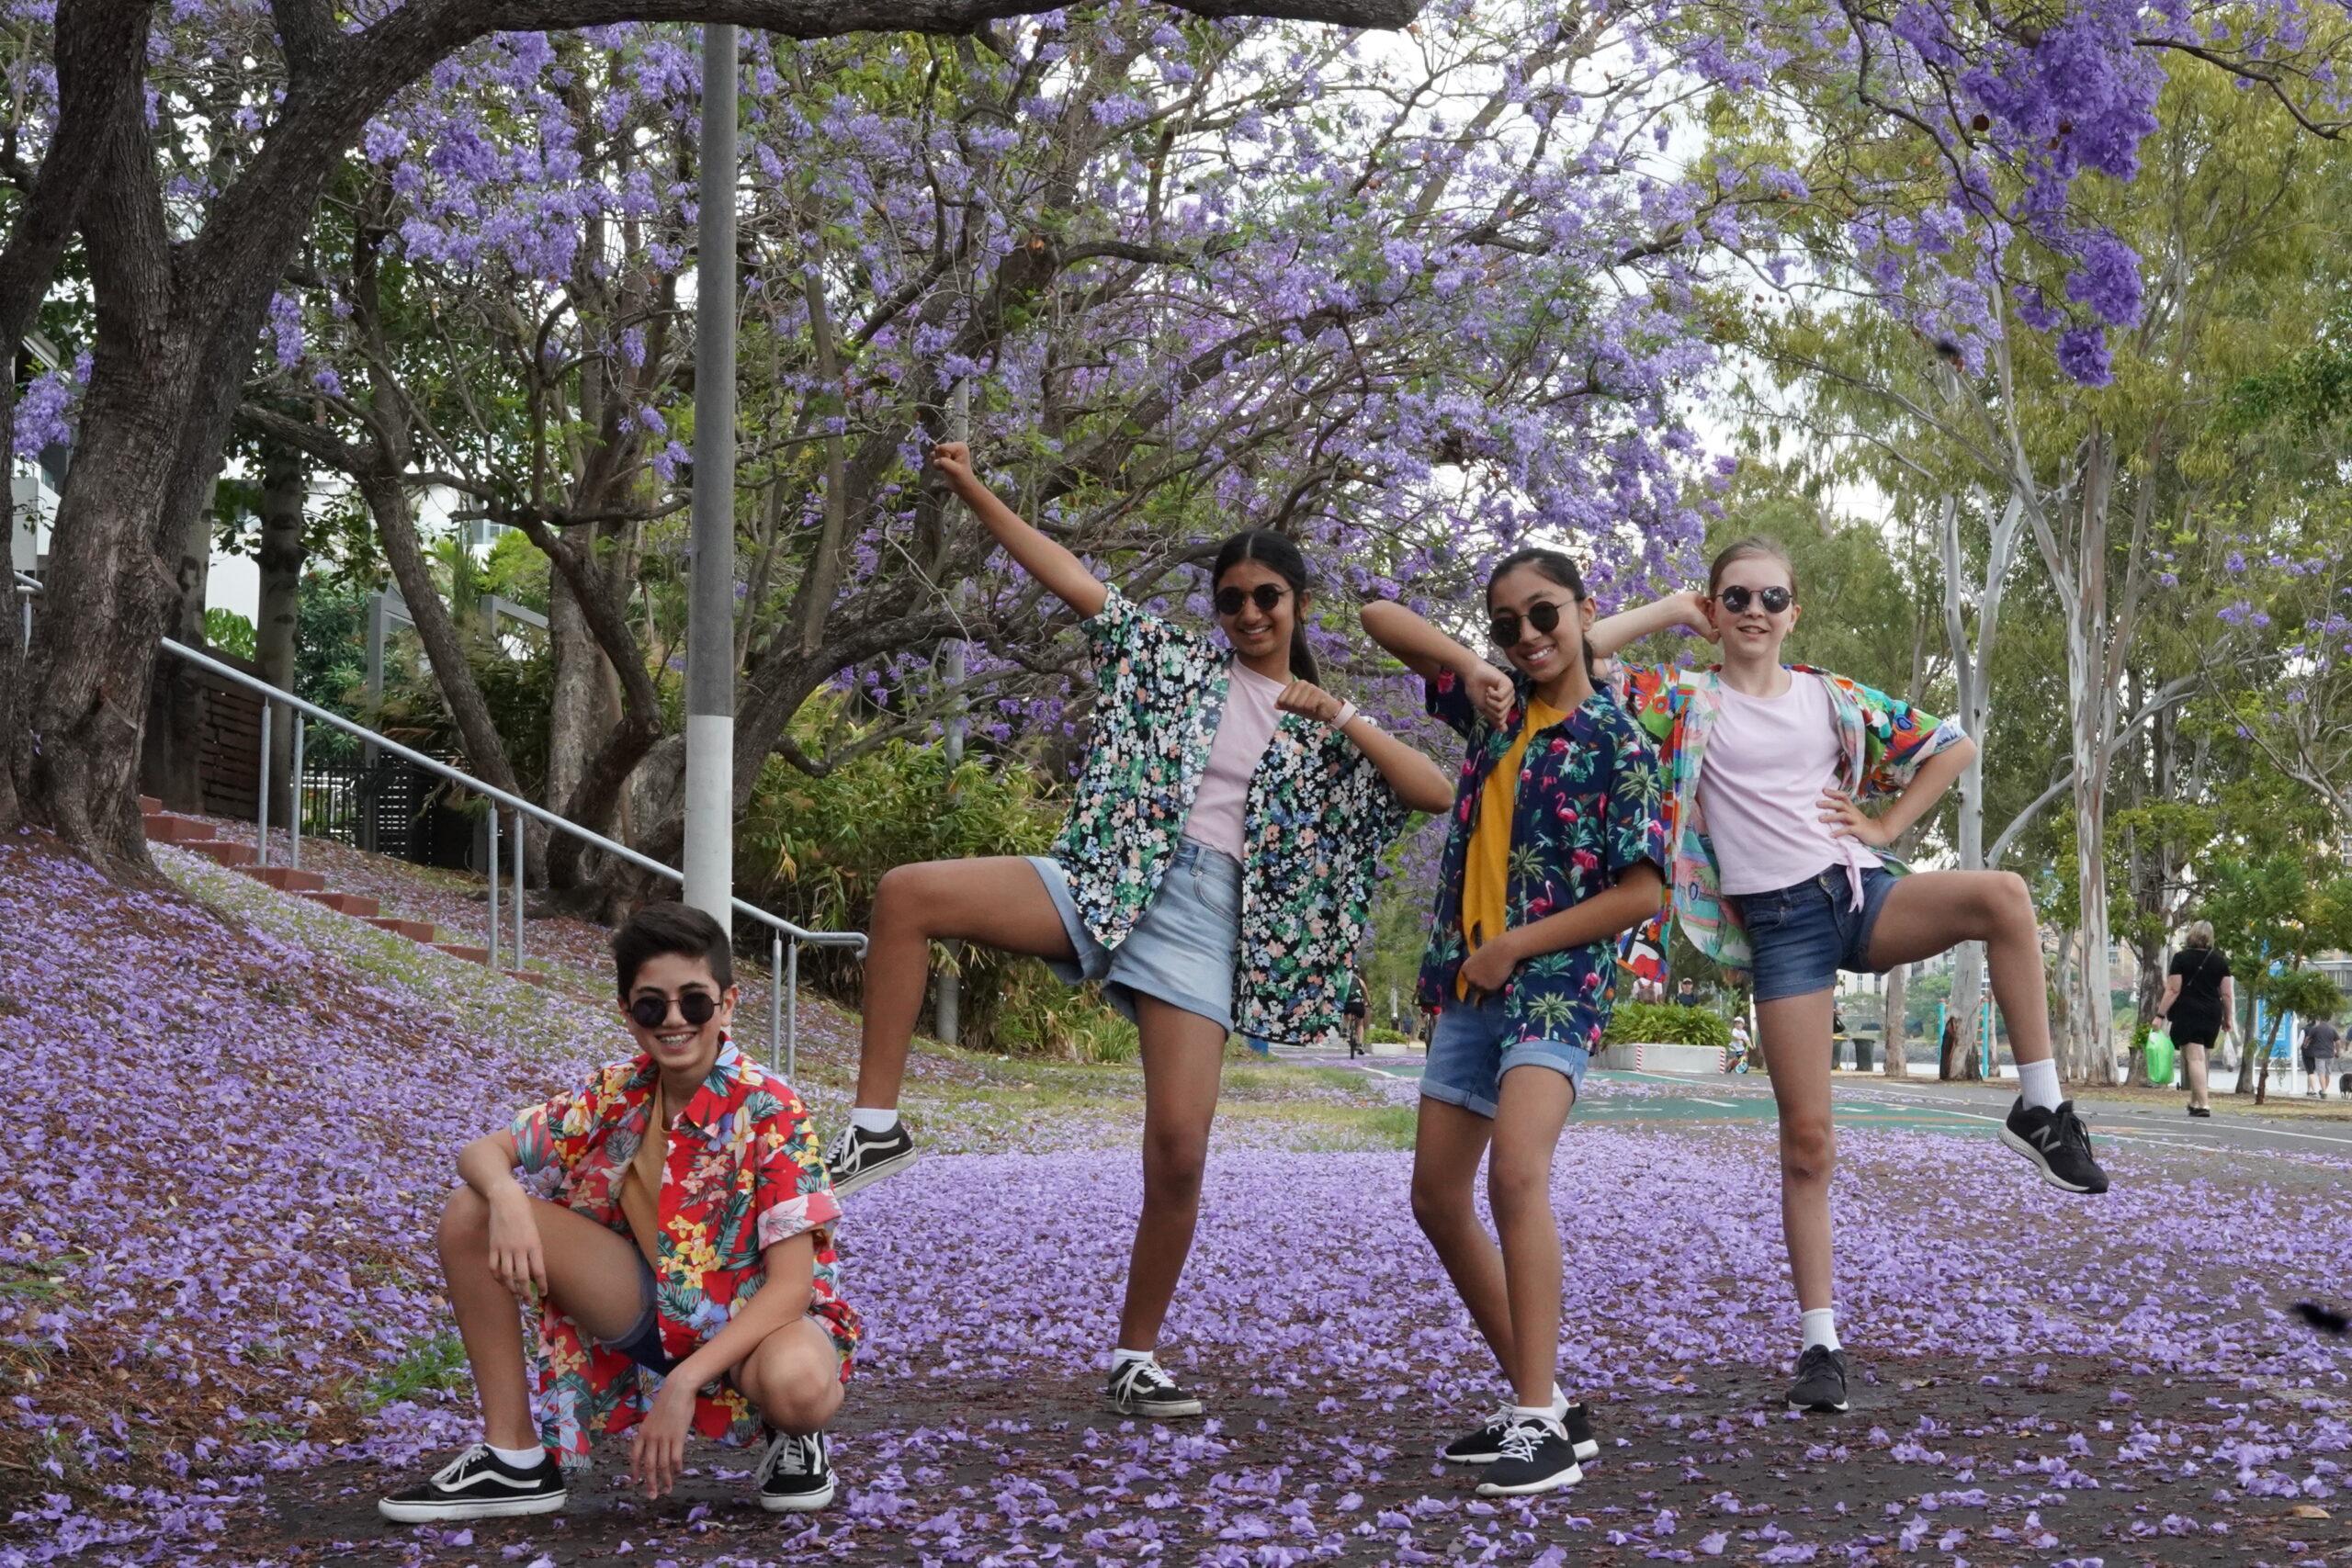 Chingari Crew - Four teenagers posing in dance poses underneath a Jacaranda Tree